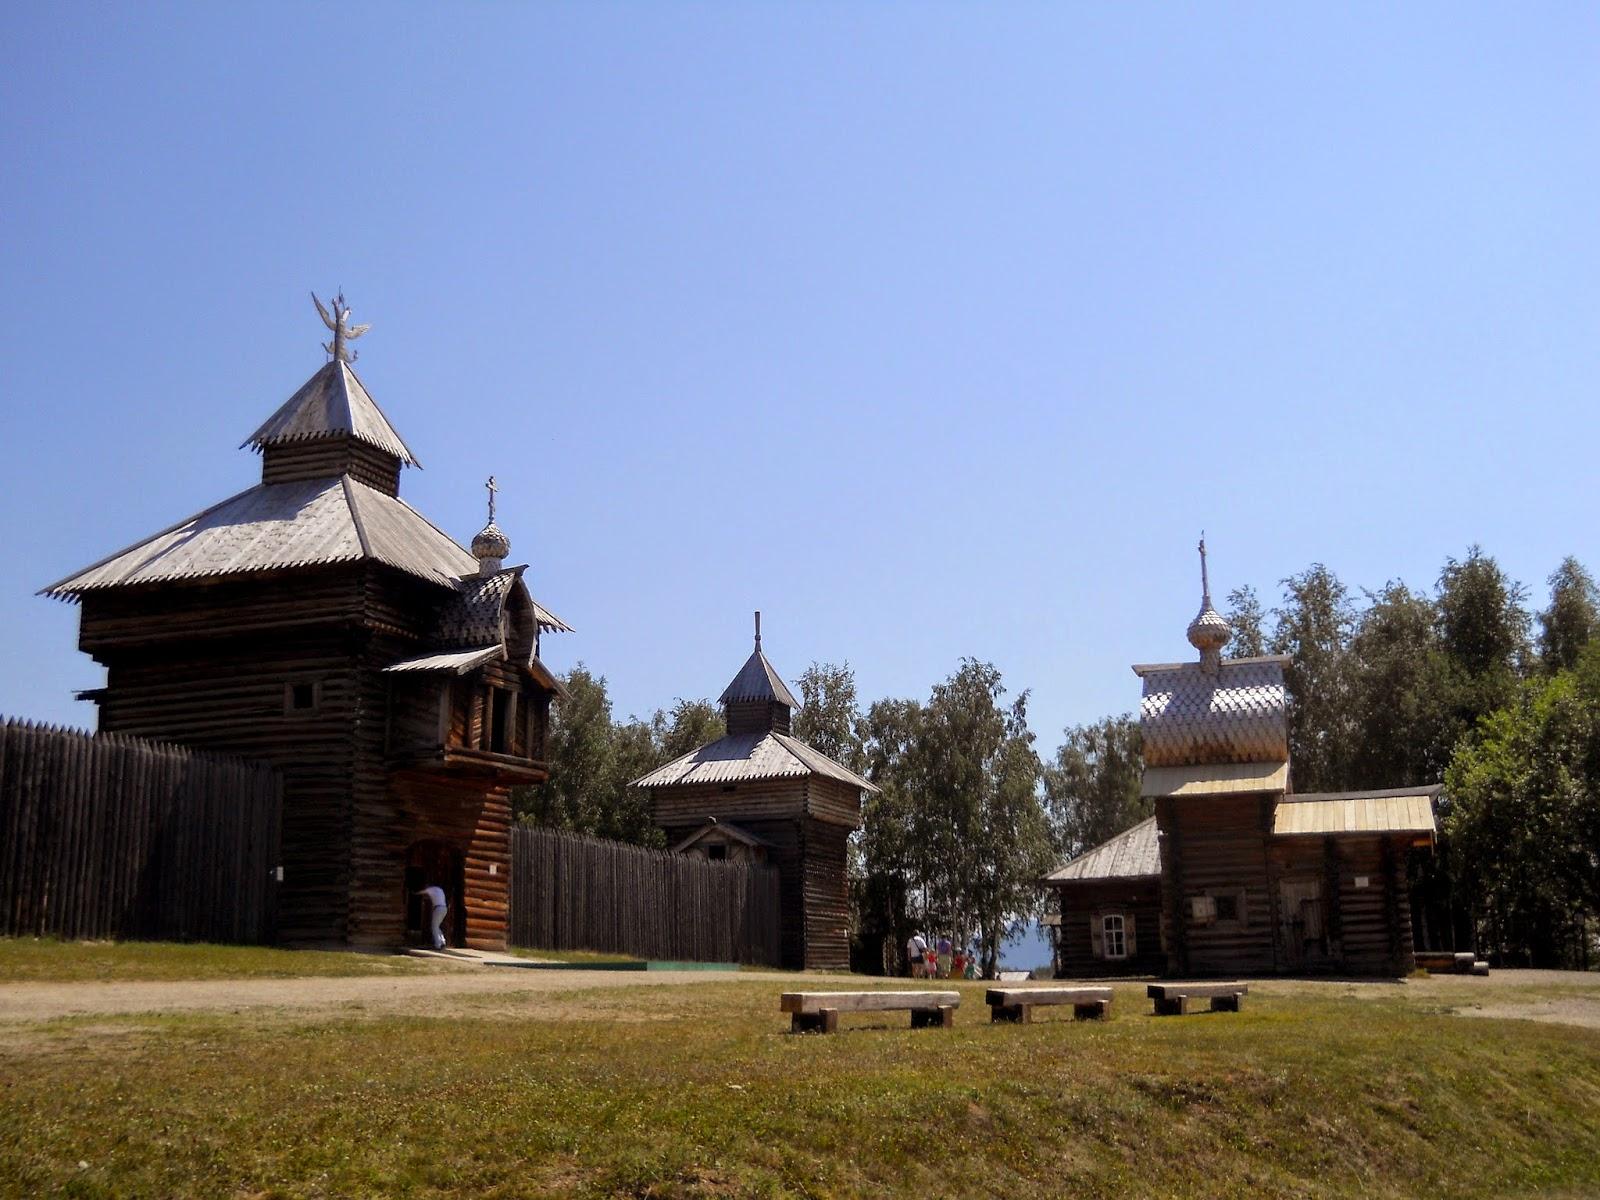 Rusko etno selo